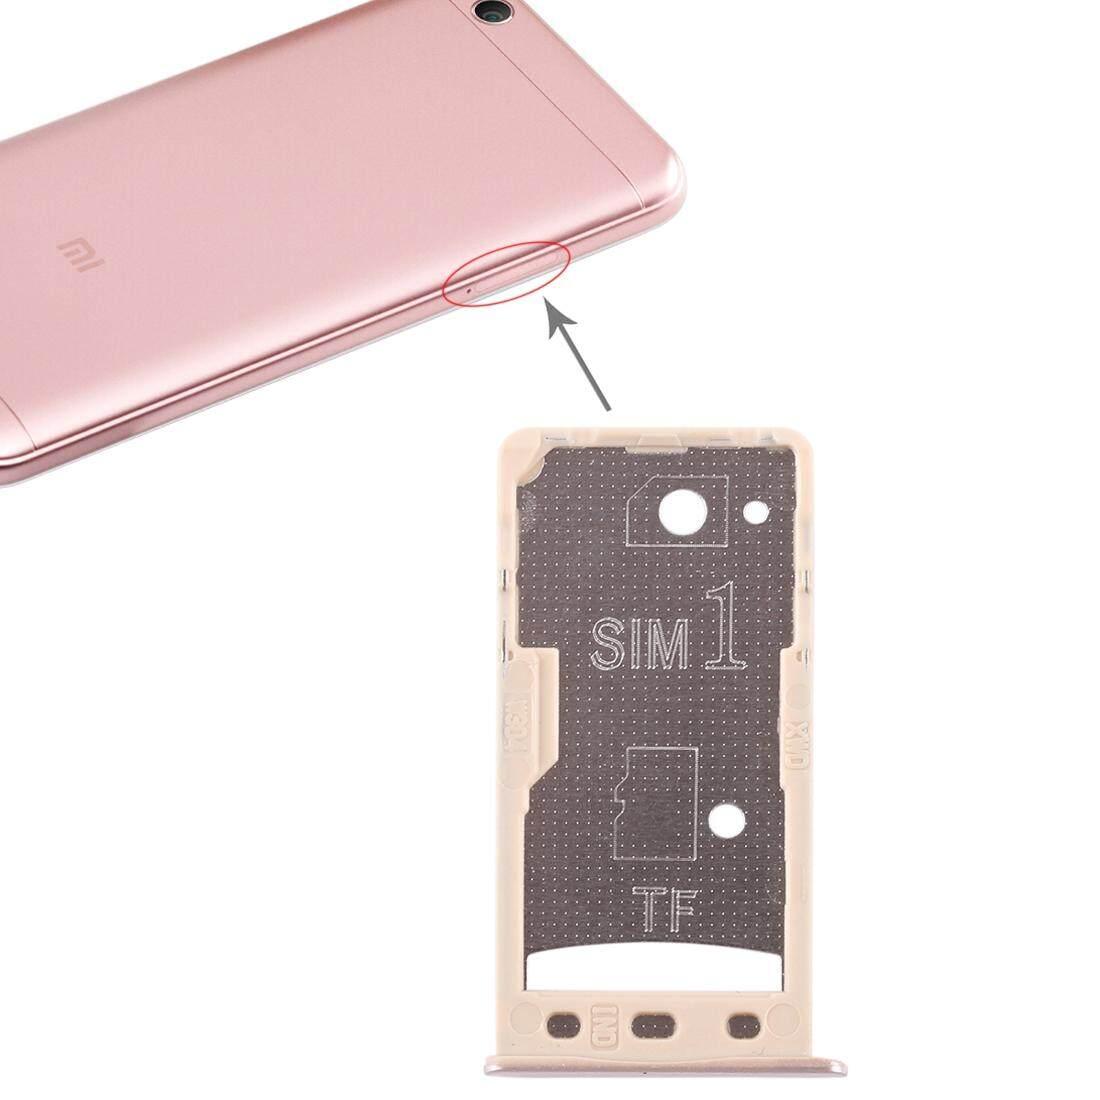 2 Kartu SIM/Micro Tray SD Card untuk Xiaomi Redmi 5A (Emas)